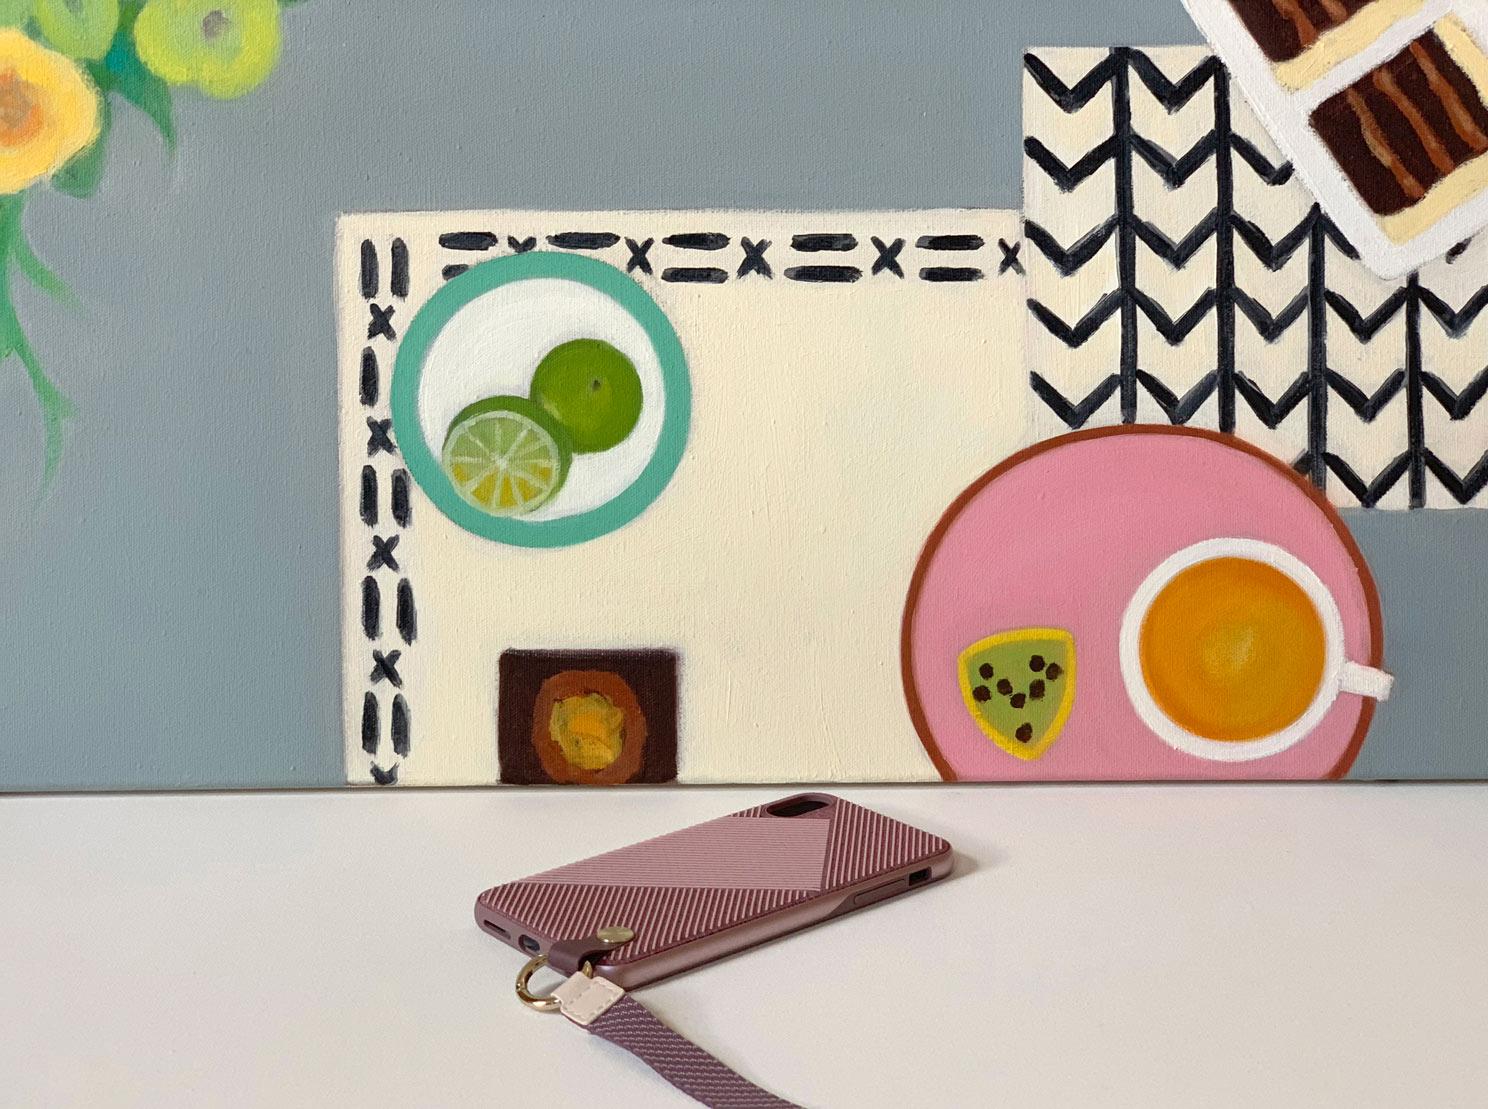 IPhone-XS-Max-Moshi-Altra-Case-Strap-Giselle-Ayupova-Painting-Tea-Chocolate-Cake-1.jpg